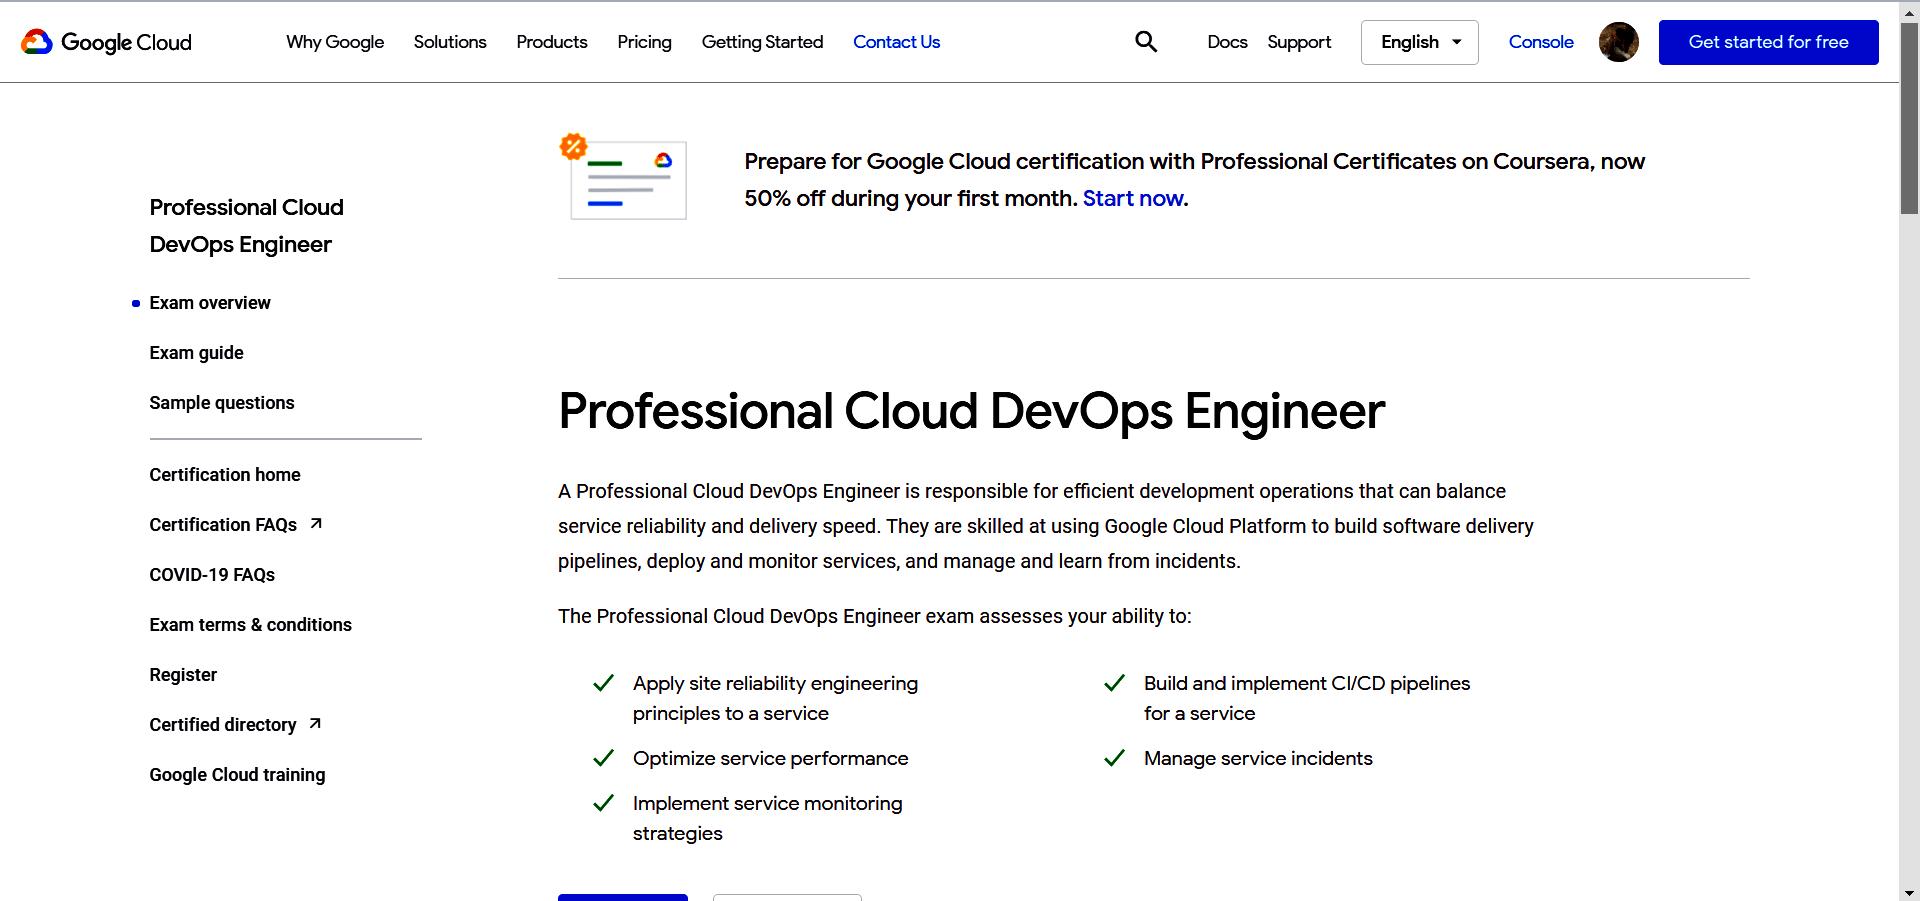 Google - Professional Cloud DevOps Engineer